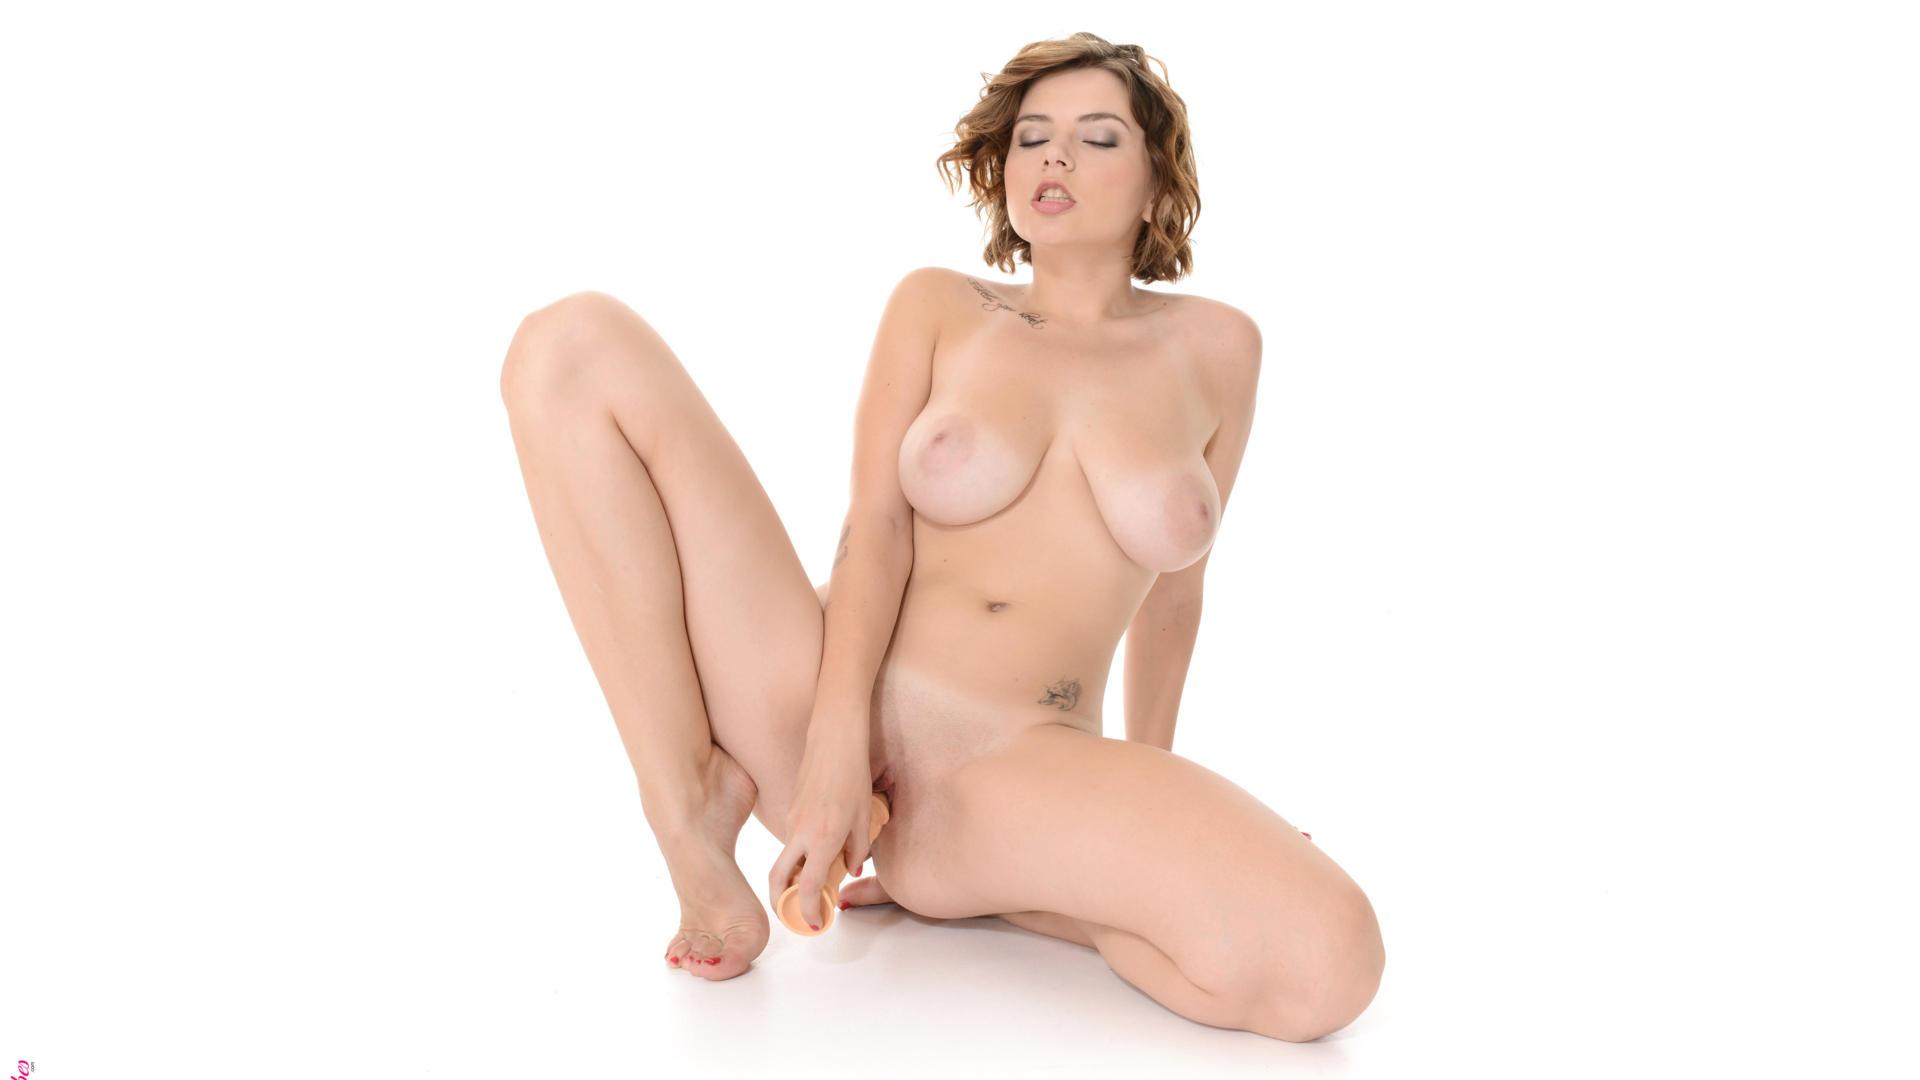 ... boobs, natural boobs, masturbating, big tits, tits, boobs - ID: 183795